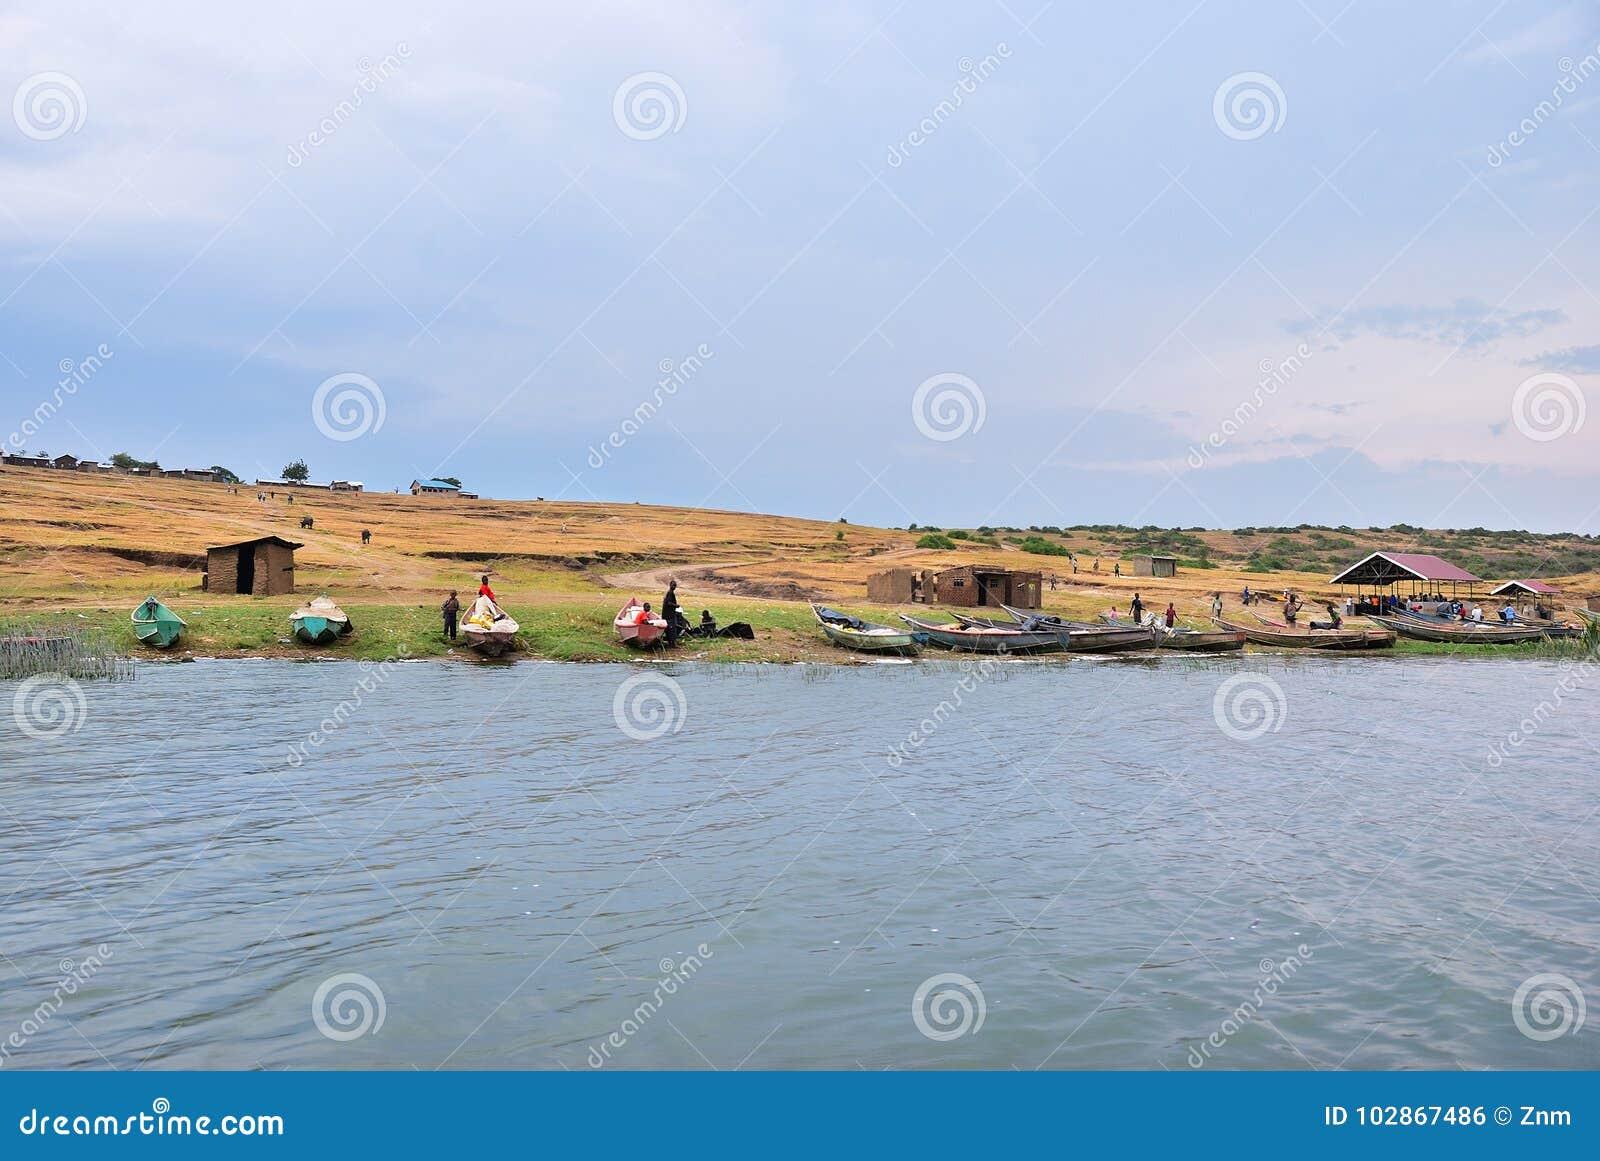 La Manche de Kazinga, la Reine Elizabeth National Park, Ouganda